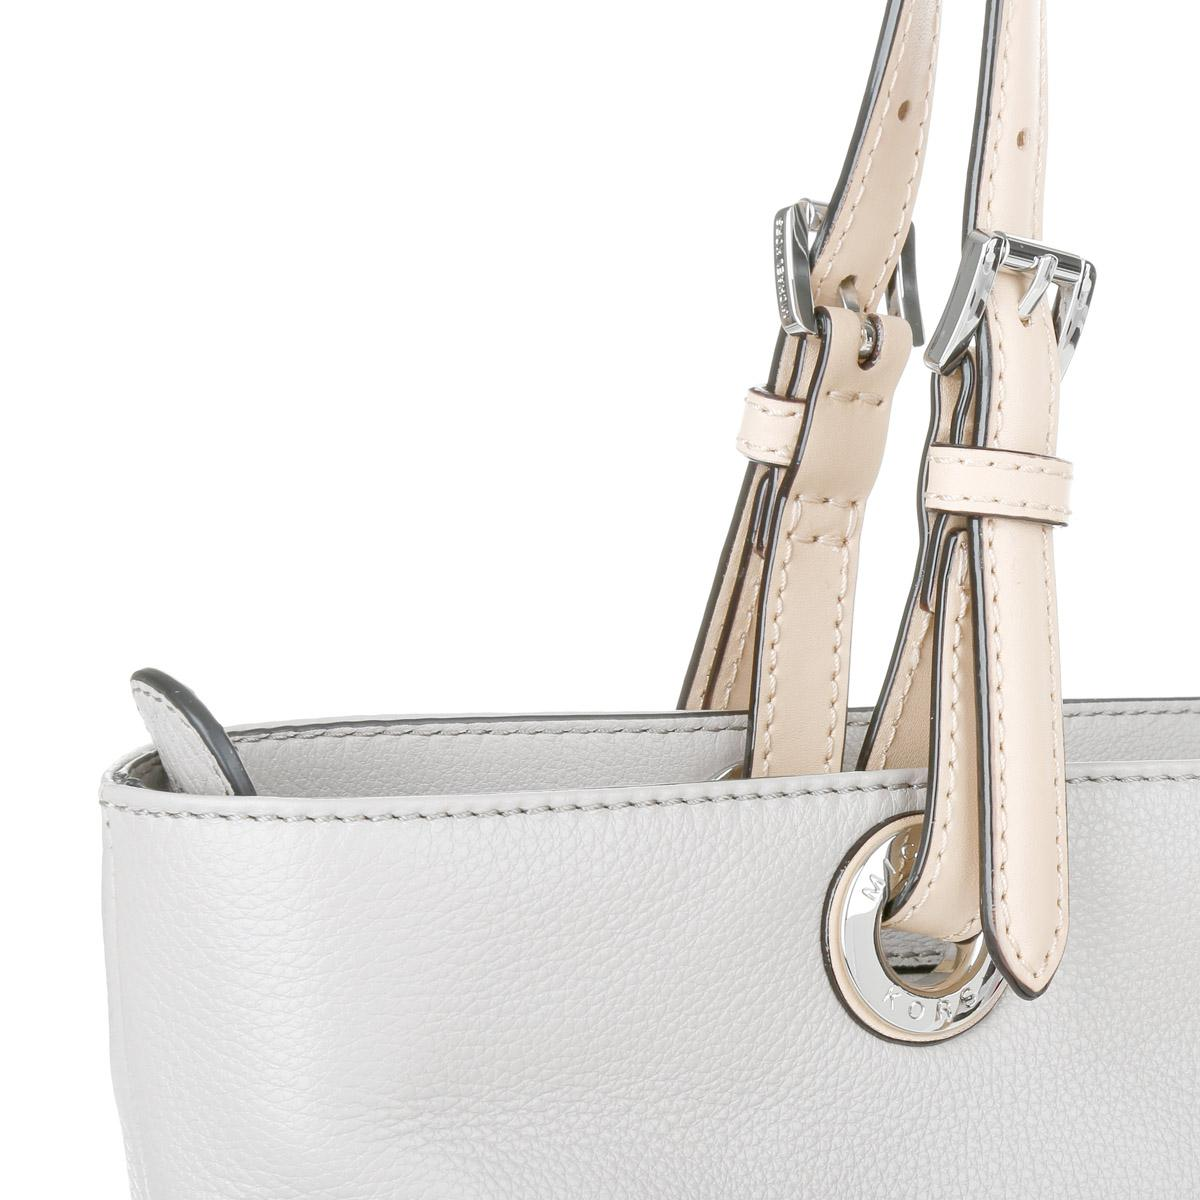 Michael Kors Leather Bedford Tz Pocket Tote Pearl Grey in Grey